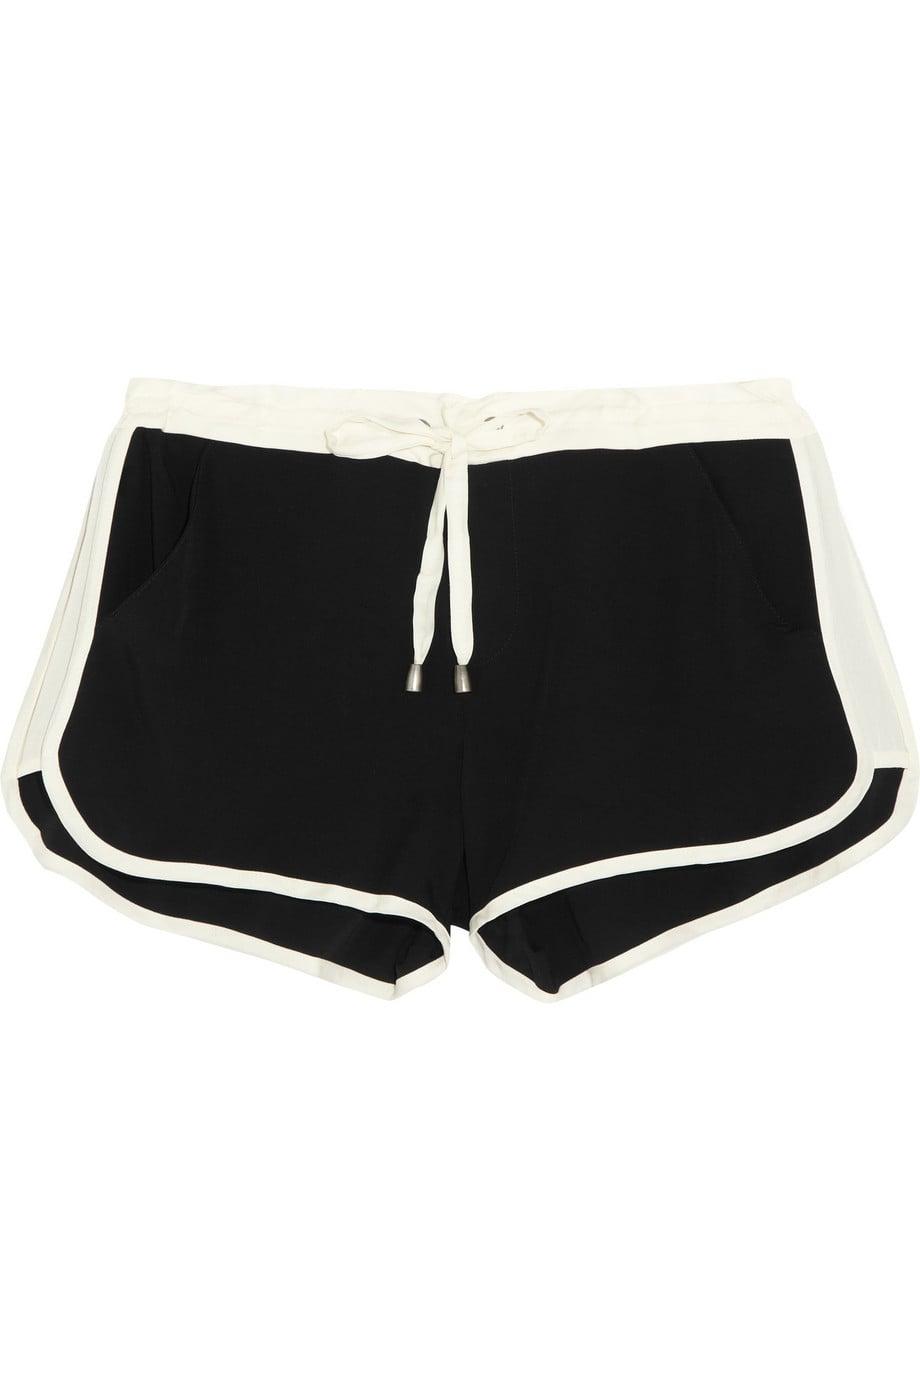 Splendid satin-jersey shorts ($95)